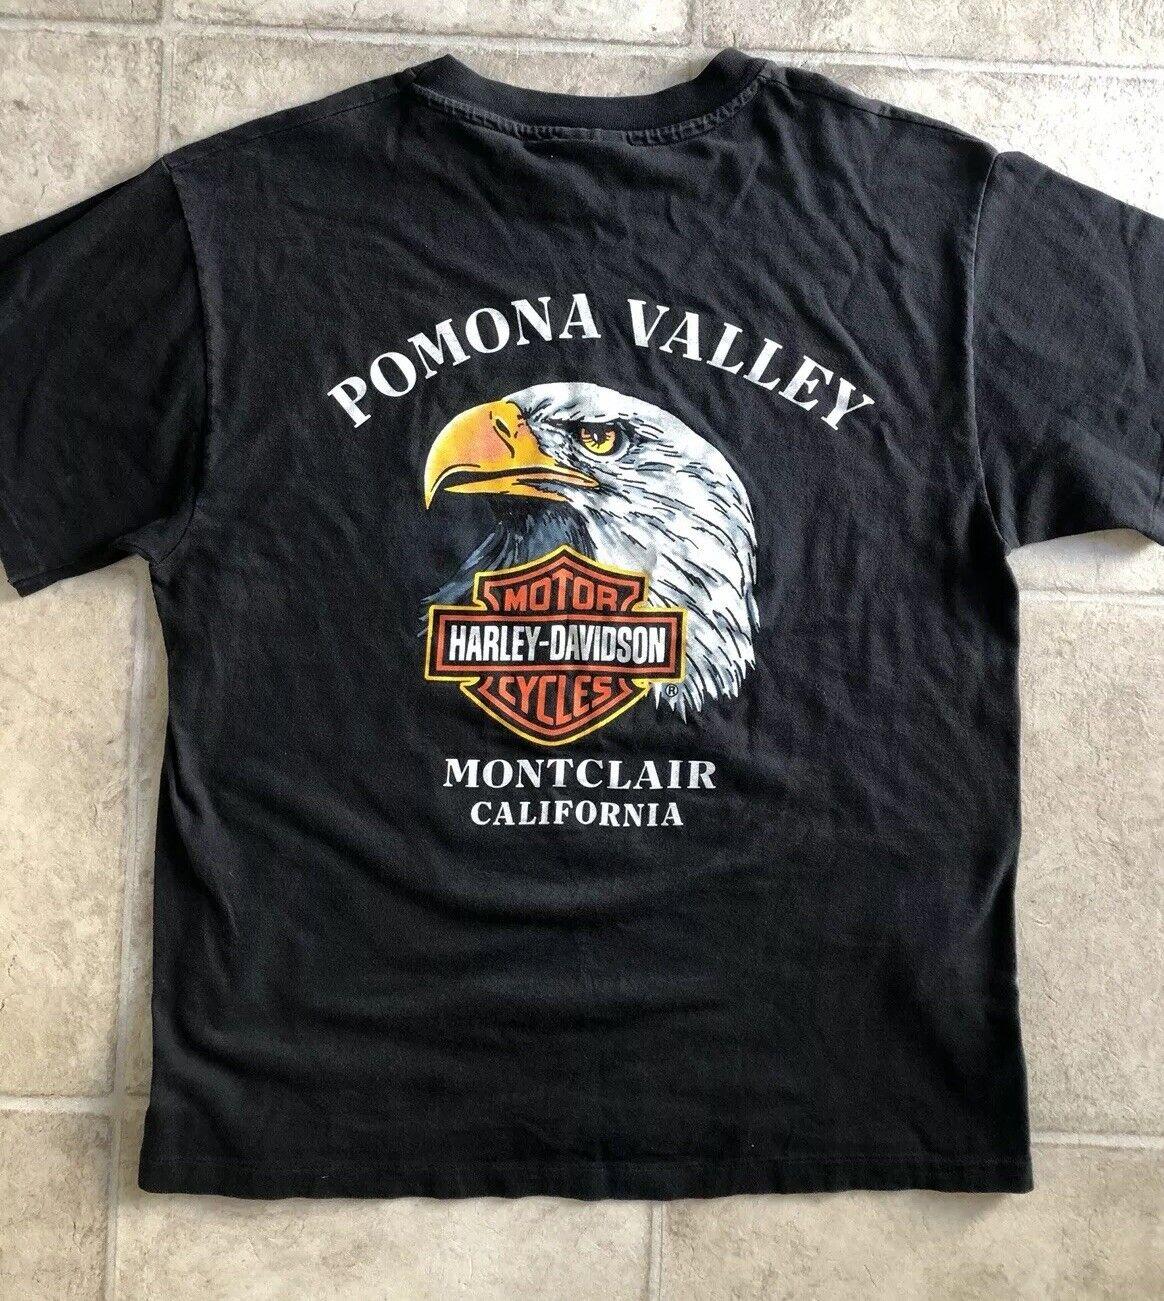 Vintage Harley Davidson CALIFORNIA Pomona Valley T-shirt Motorcycle